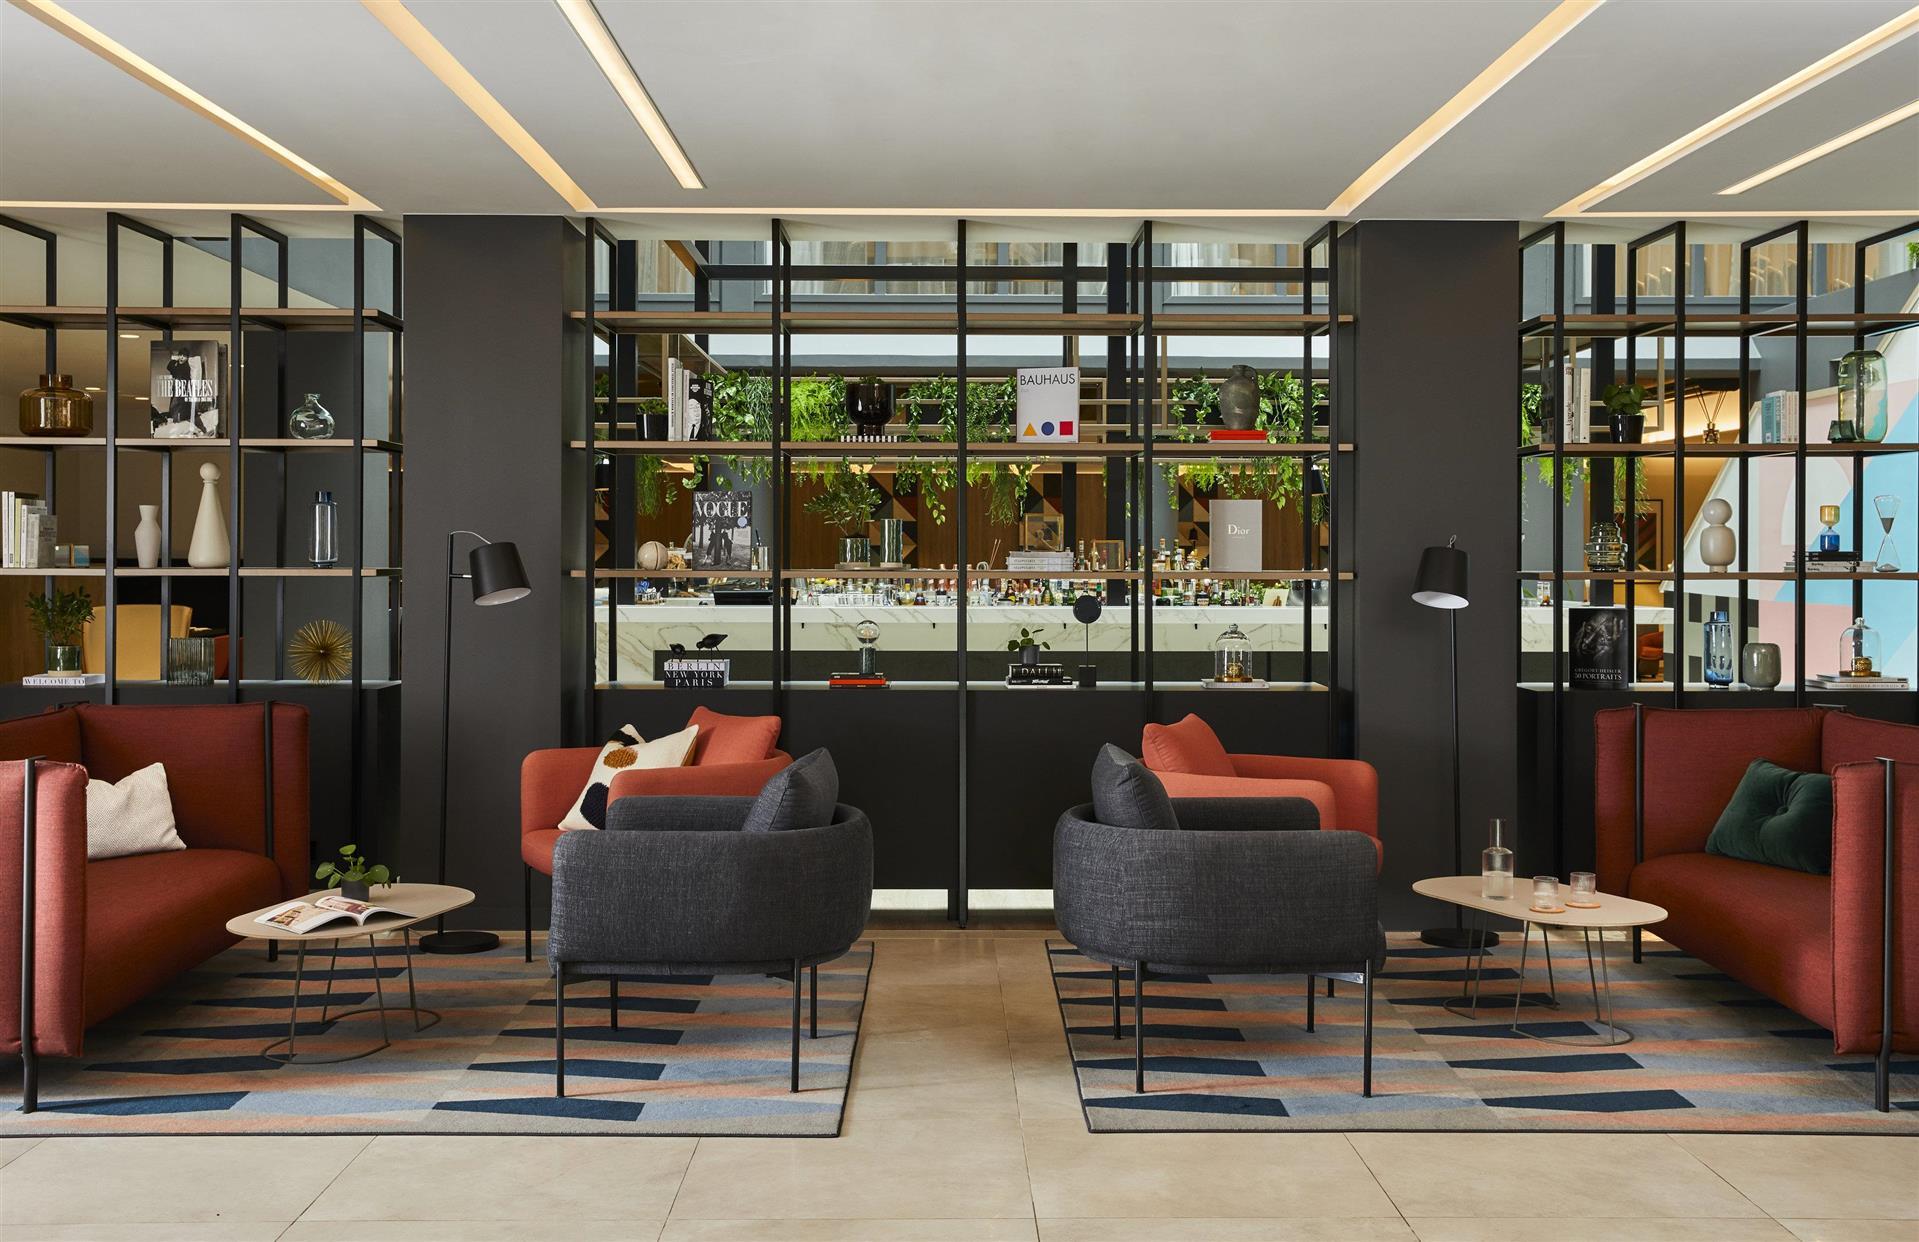 Meetings And Events At Hotel Louis C Jacob Hamburg De